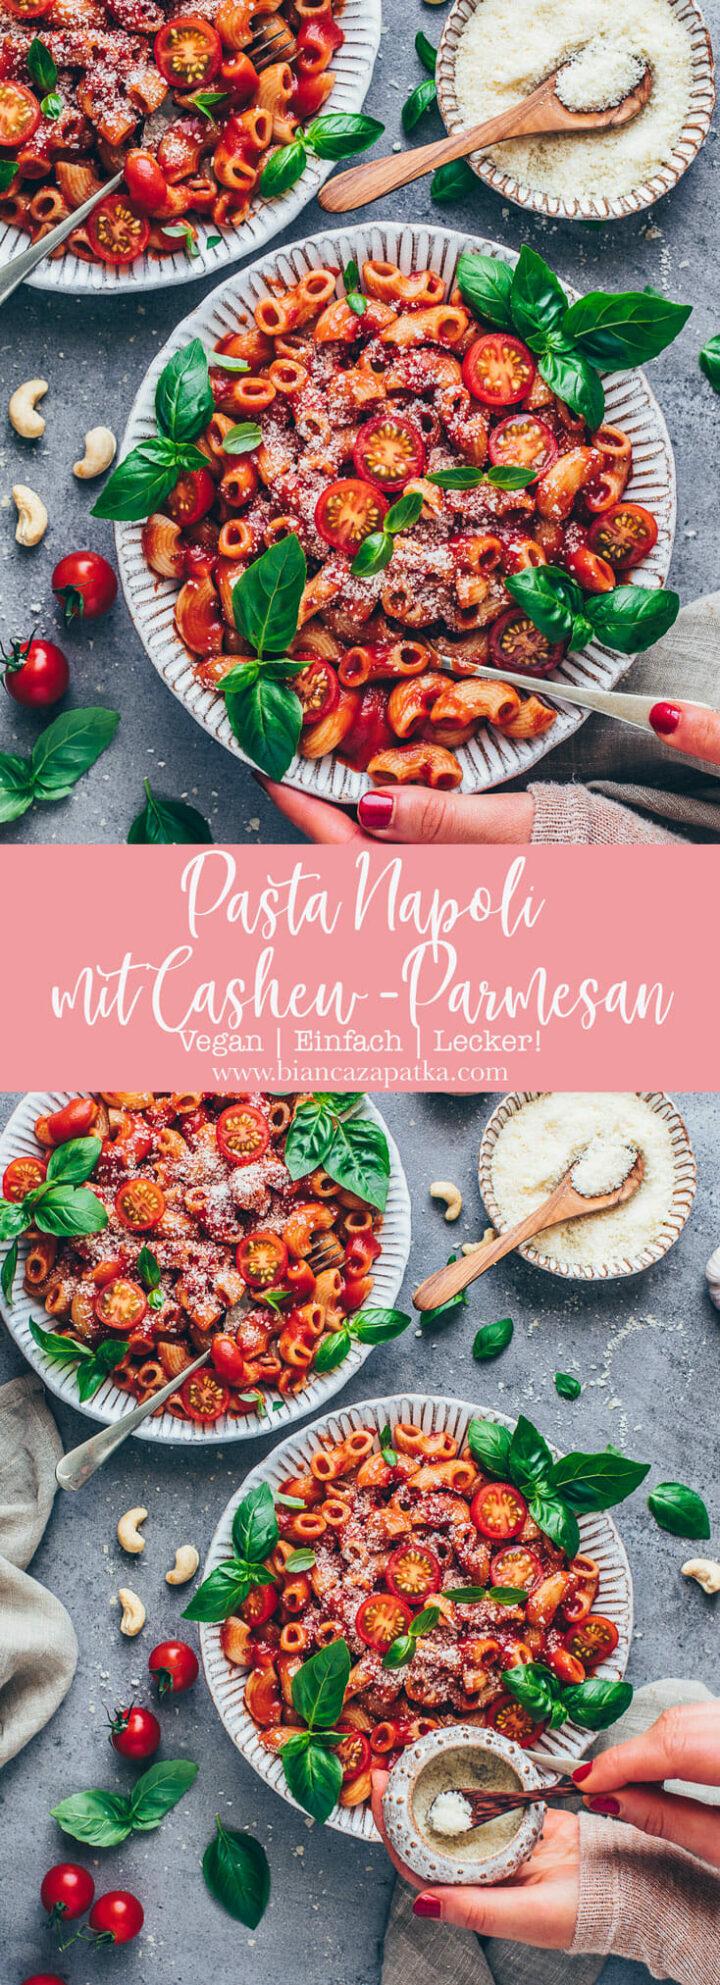 Macaroni Nudeln Napoli mit Tomaten, Basilikum, Cashew Nüsse und veganer Parmesan Käse